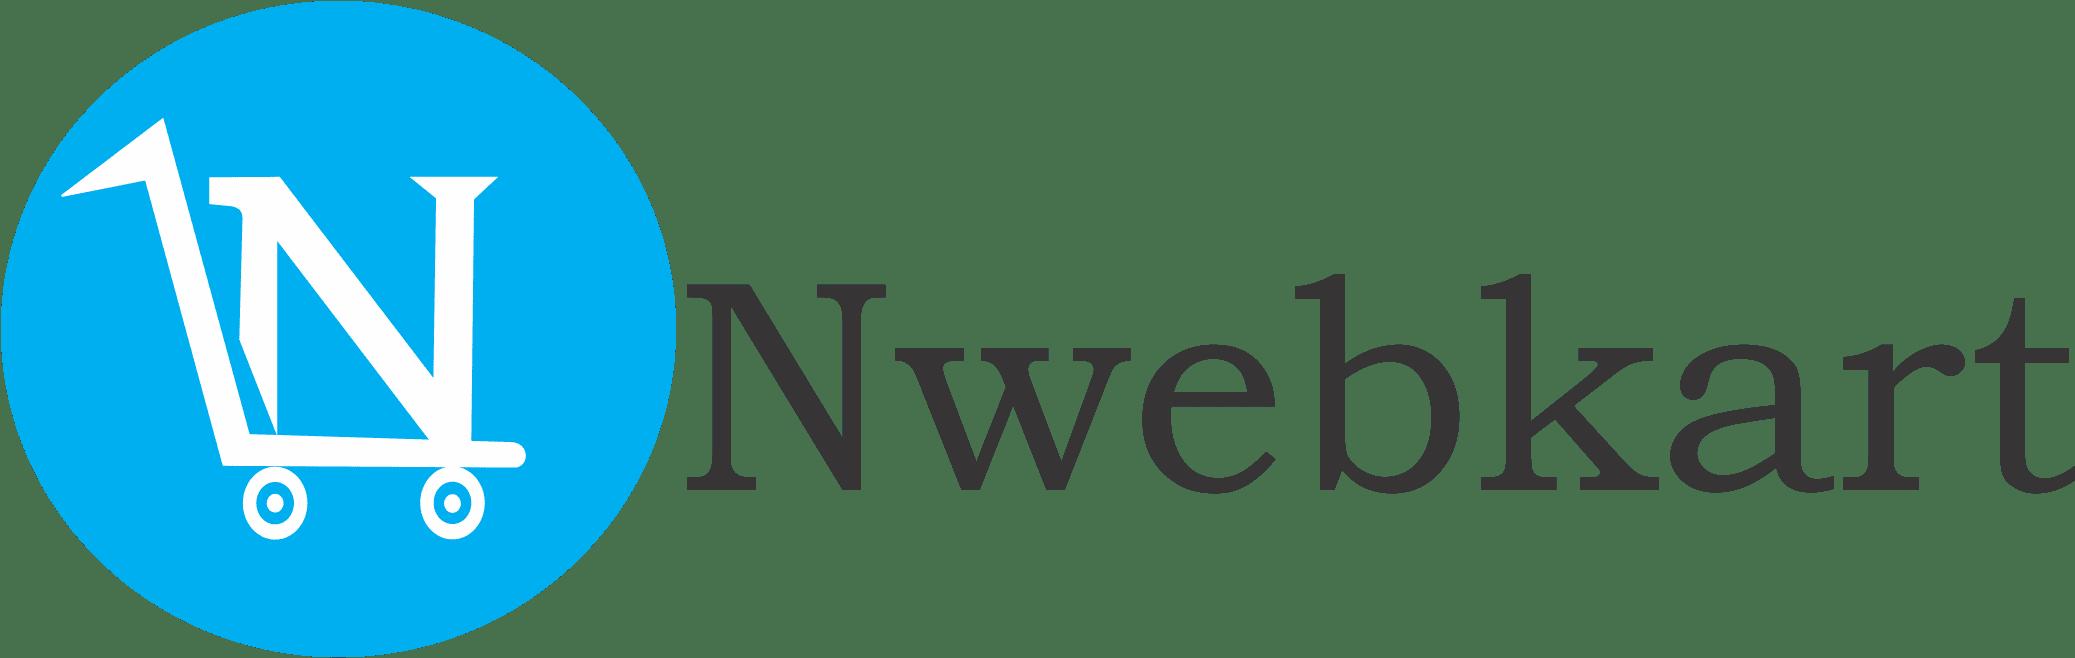 Nwebkart - Creates Online store